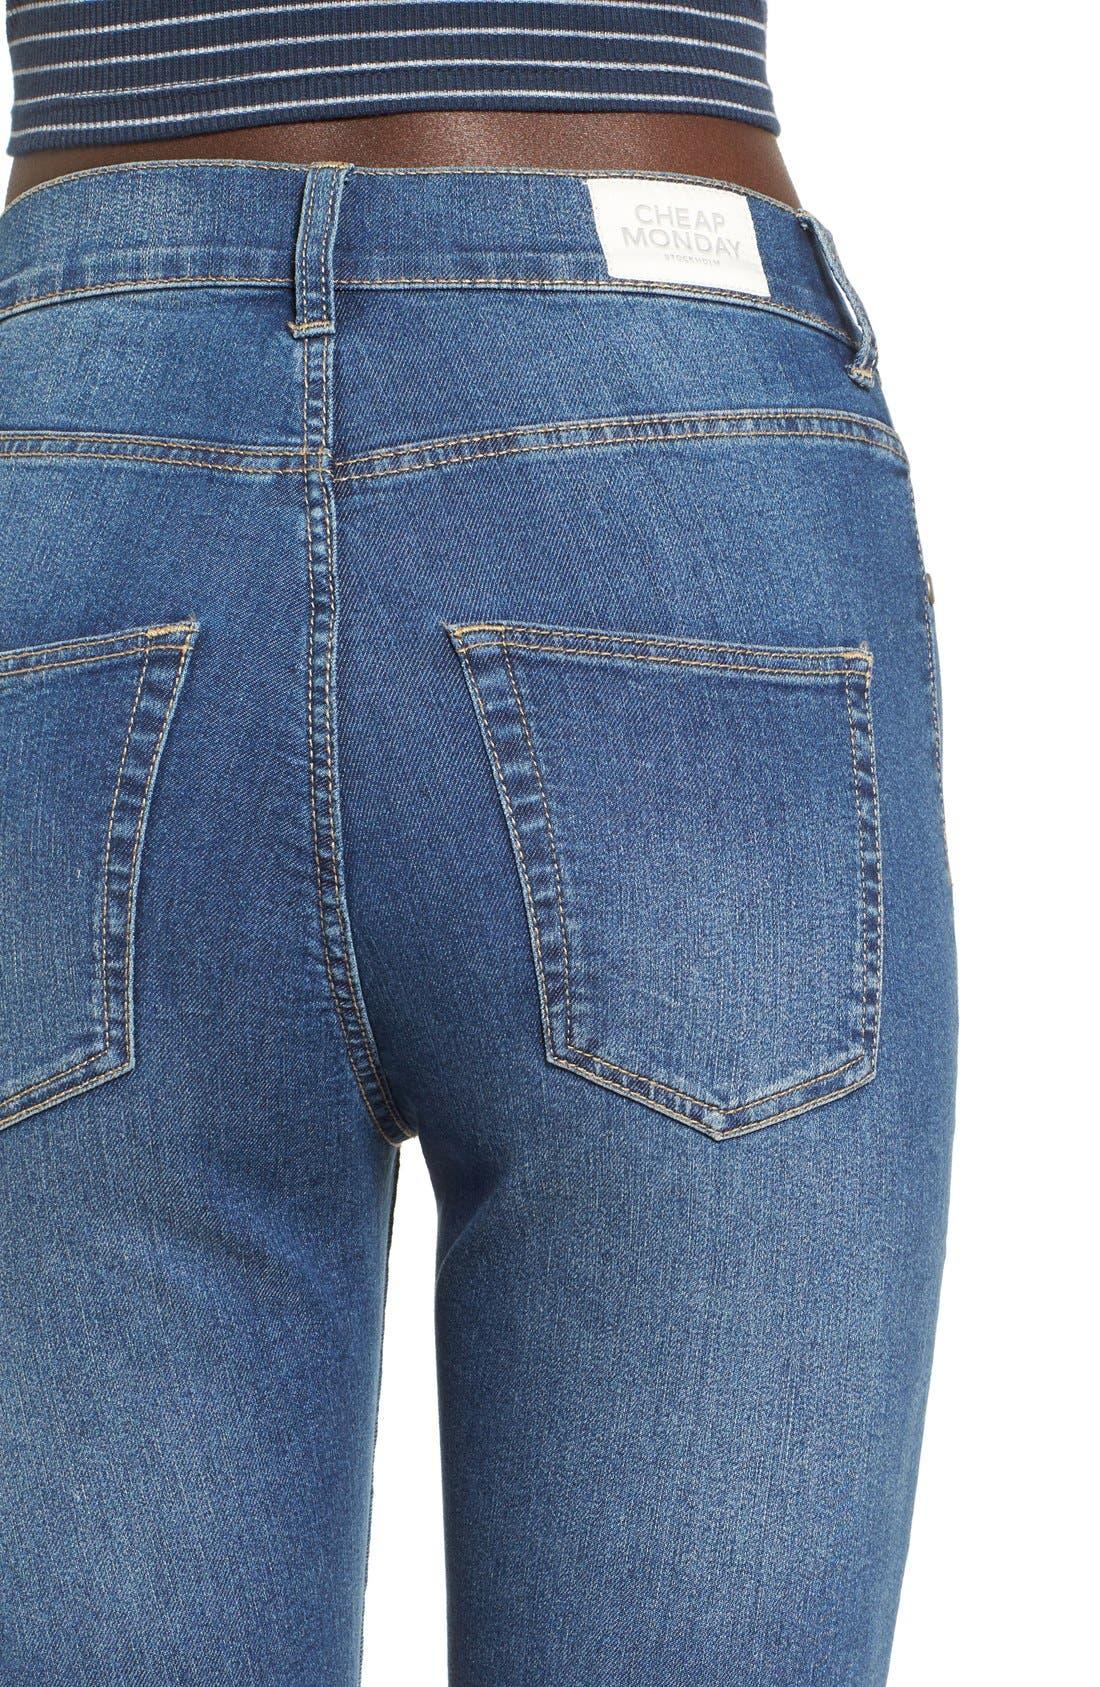 Alternate Image 4  - Cheap Monday 'High Spray' High Rise Skinny Jeans